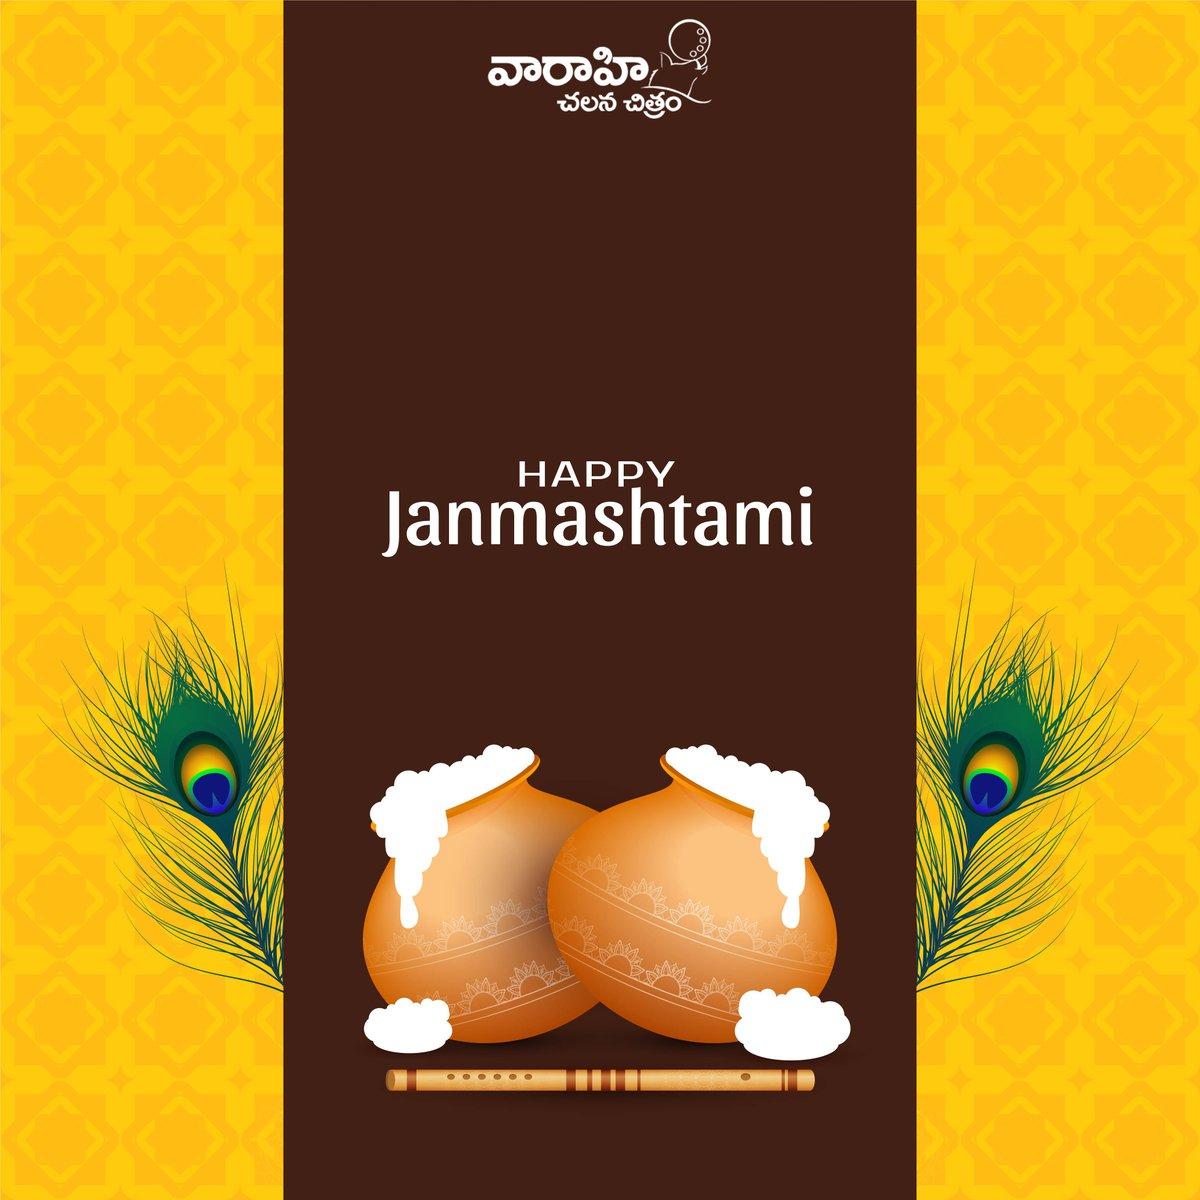 On the auspicious day of Shri Krishna Janmashtami, wish you and  your family love, light, happiness, laughter, wealth and good health.   #KrishnaJanmashtami https://t.co/ERMYUNgU45